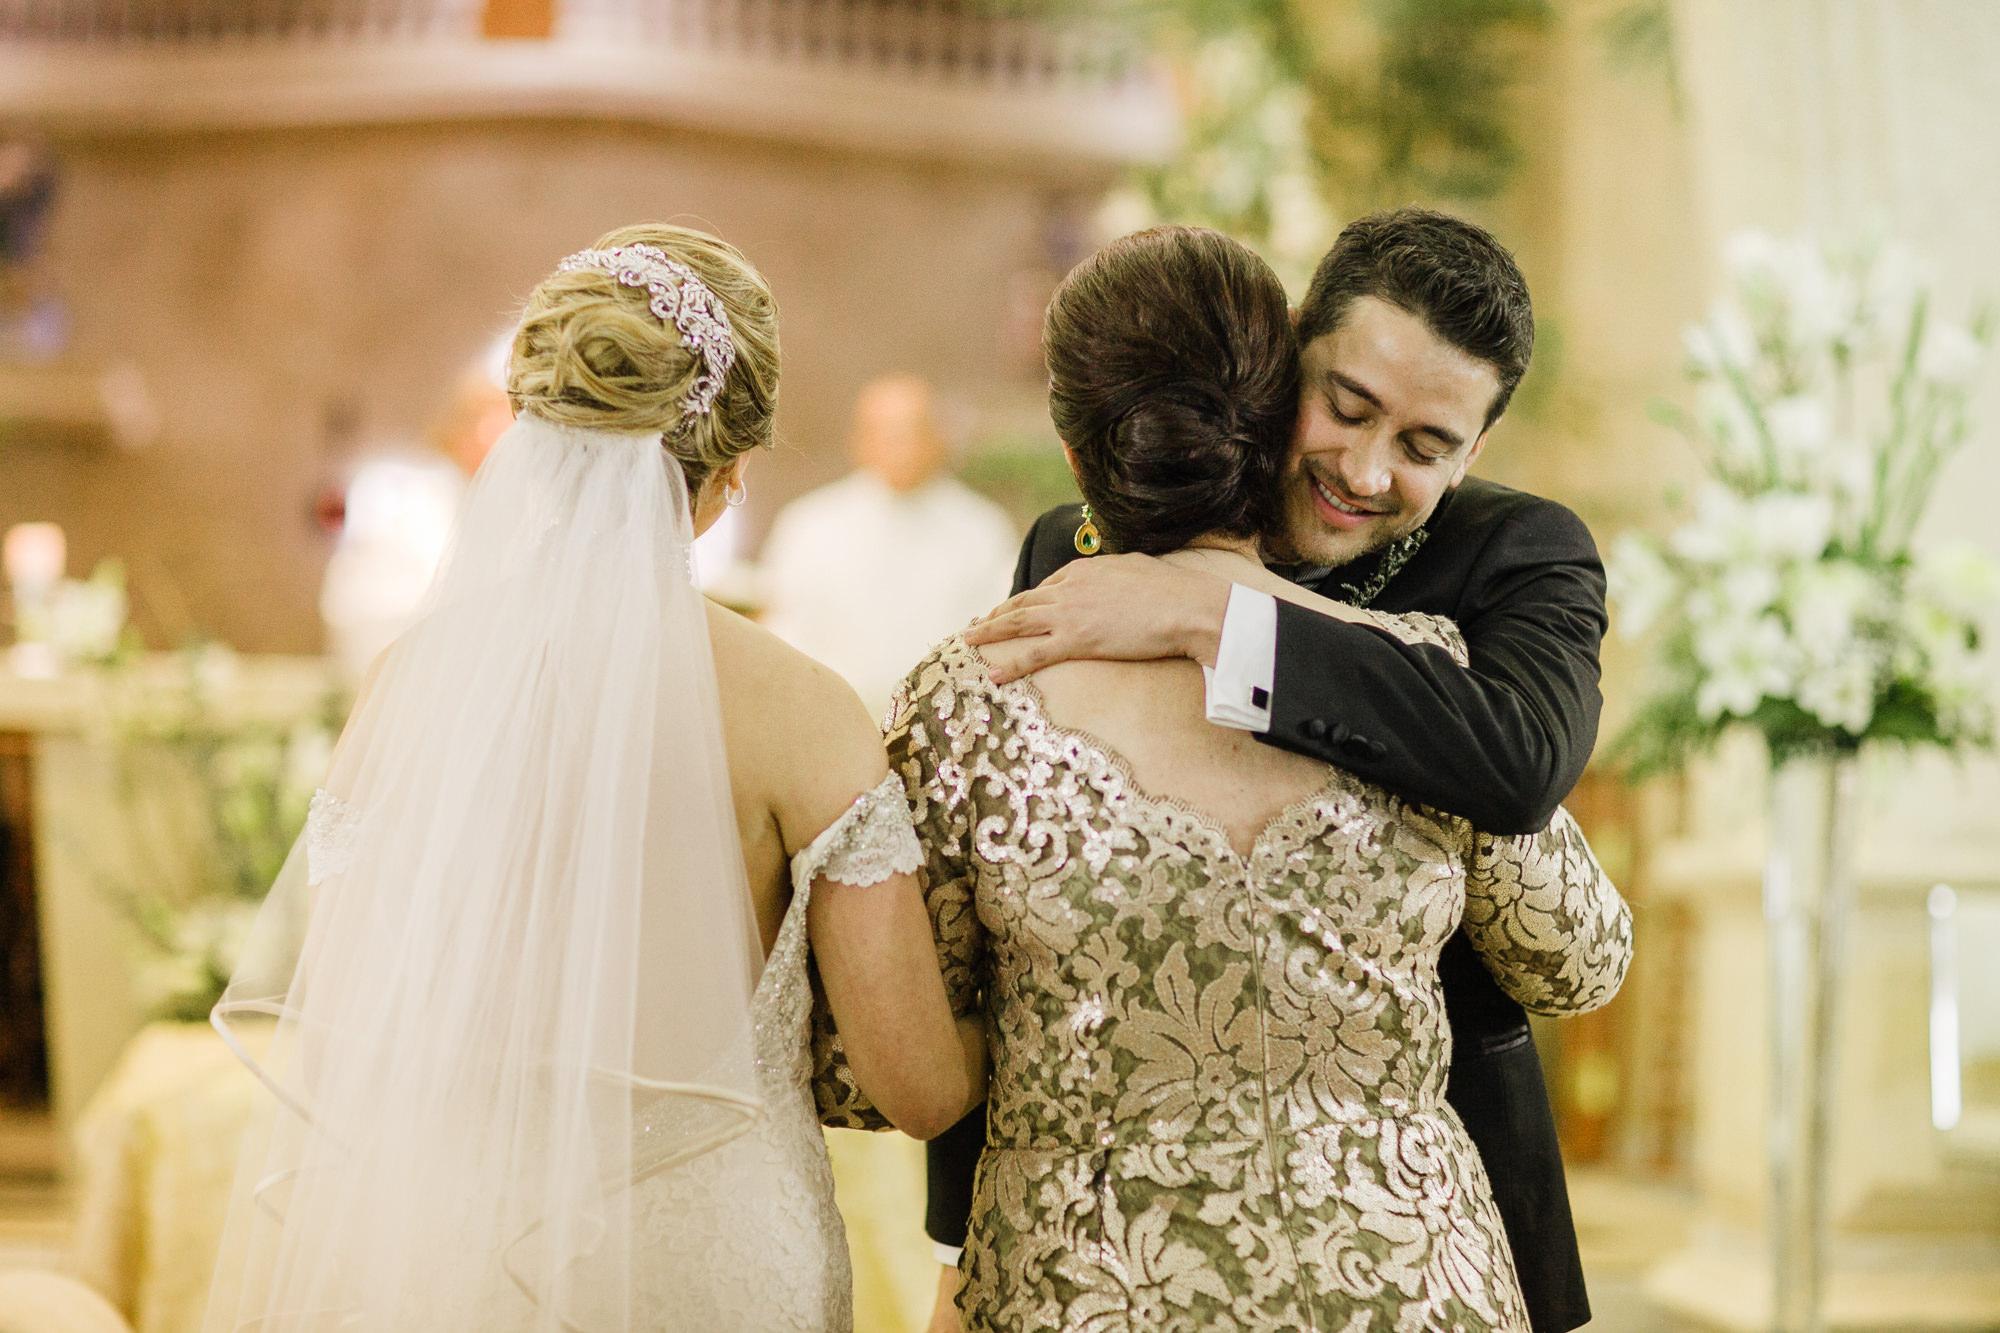 Mario-Karla-Wedding-189